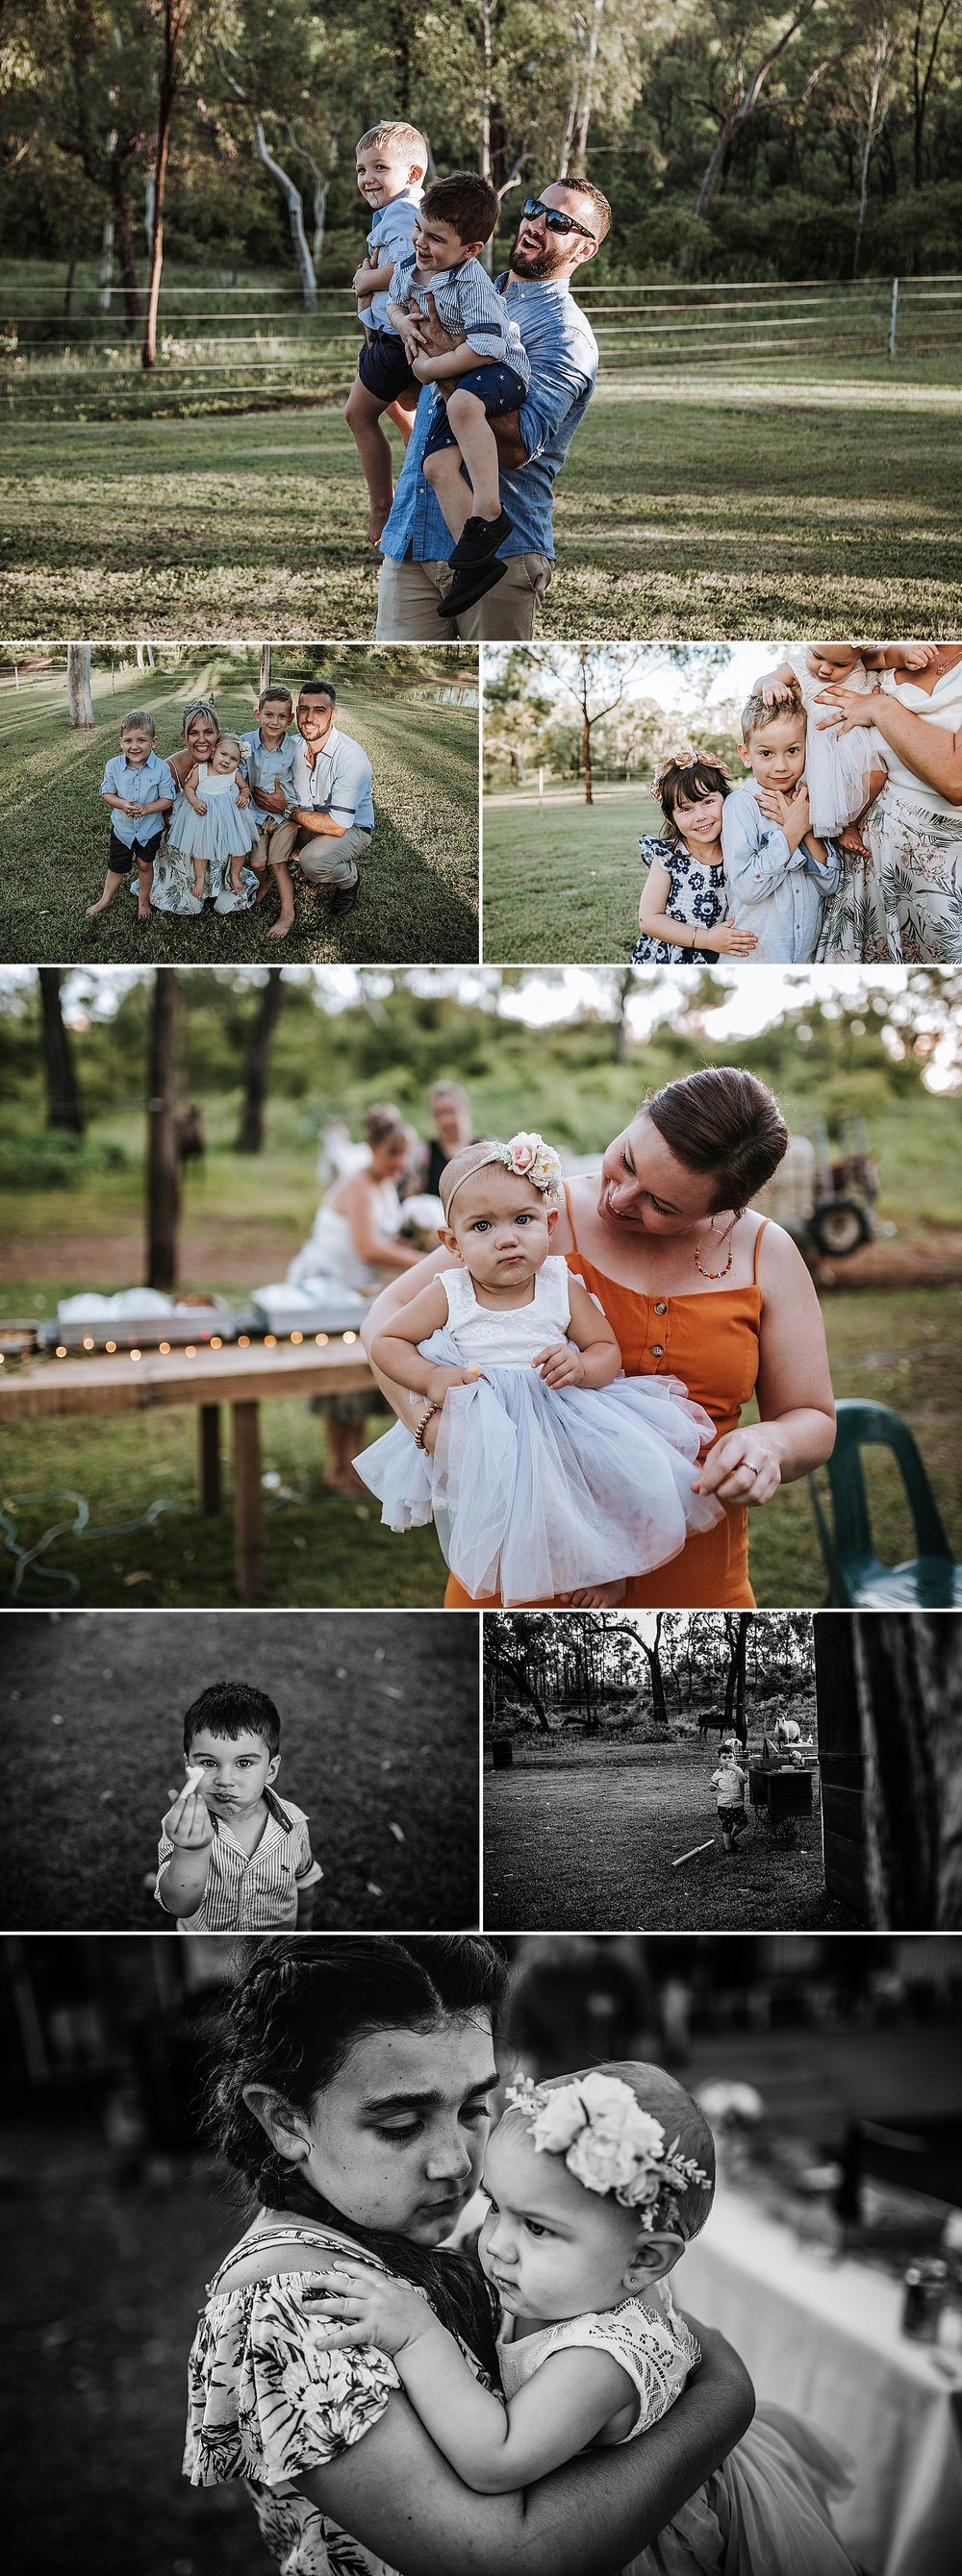 Family-portraits-documentary-lifestyle-event-photoshoot